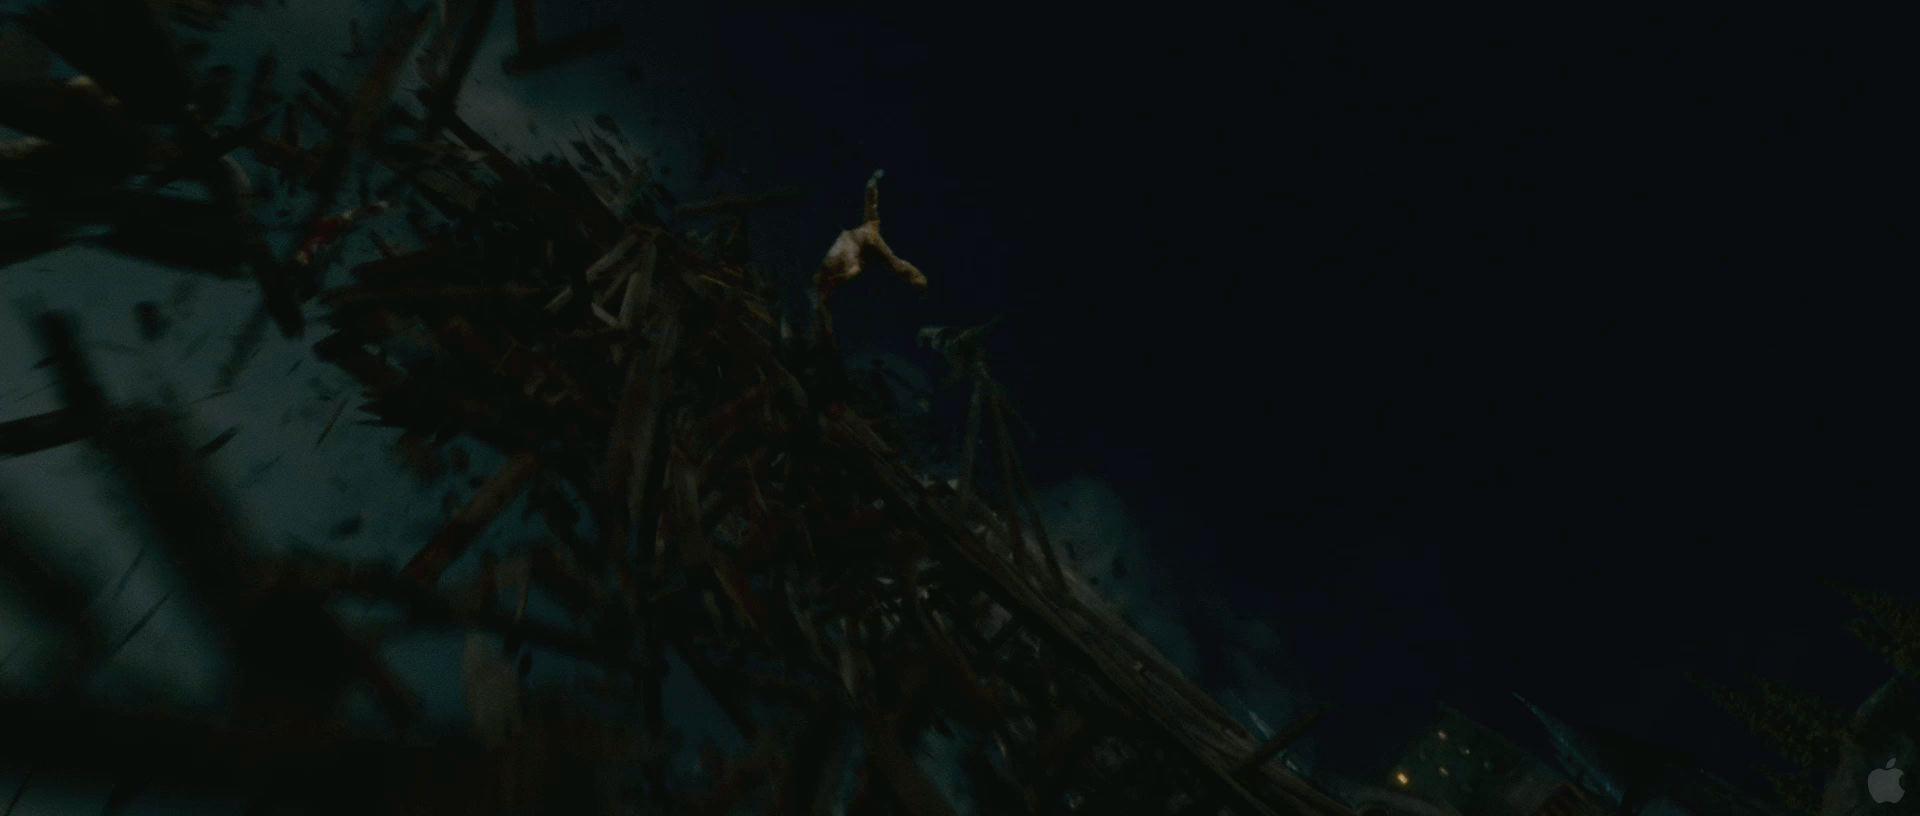 Harry Potter BlogHogwarts HP7 2 Trailer 75